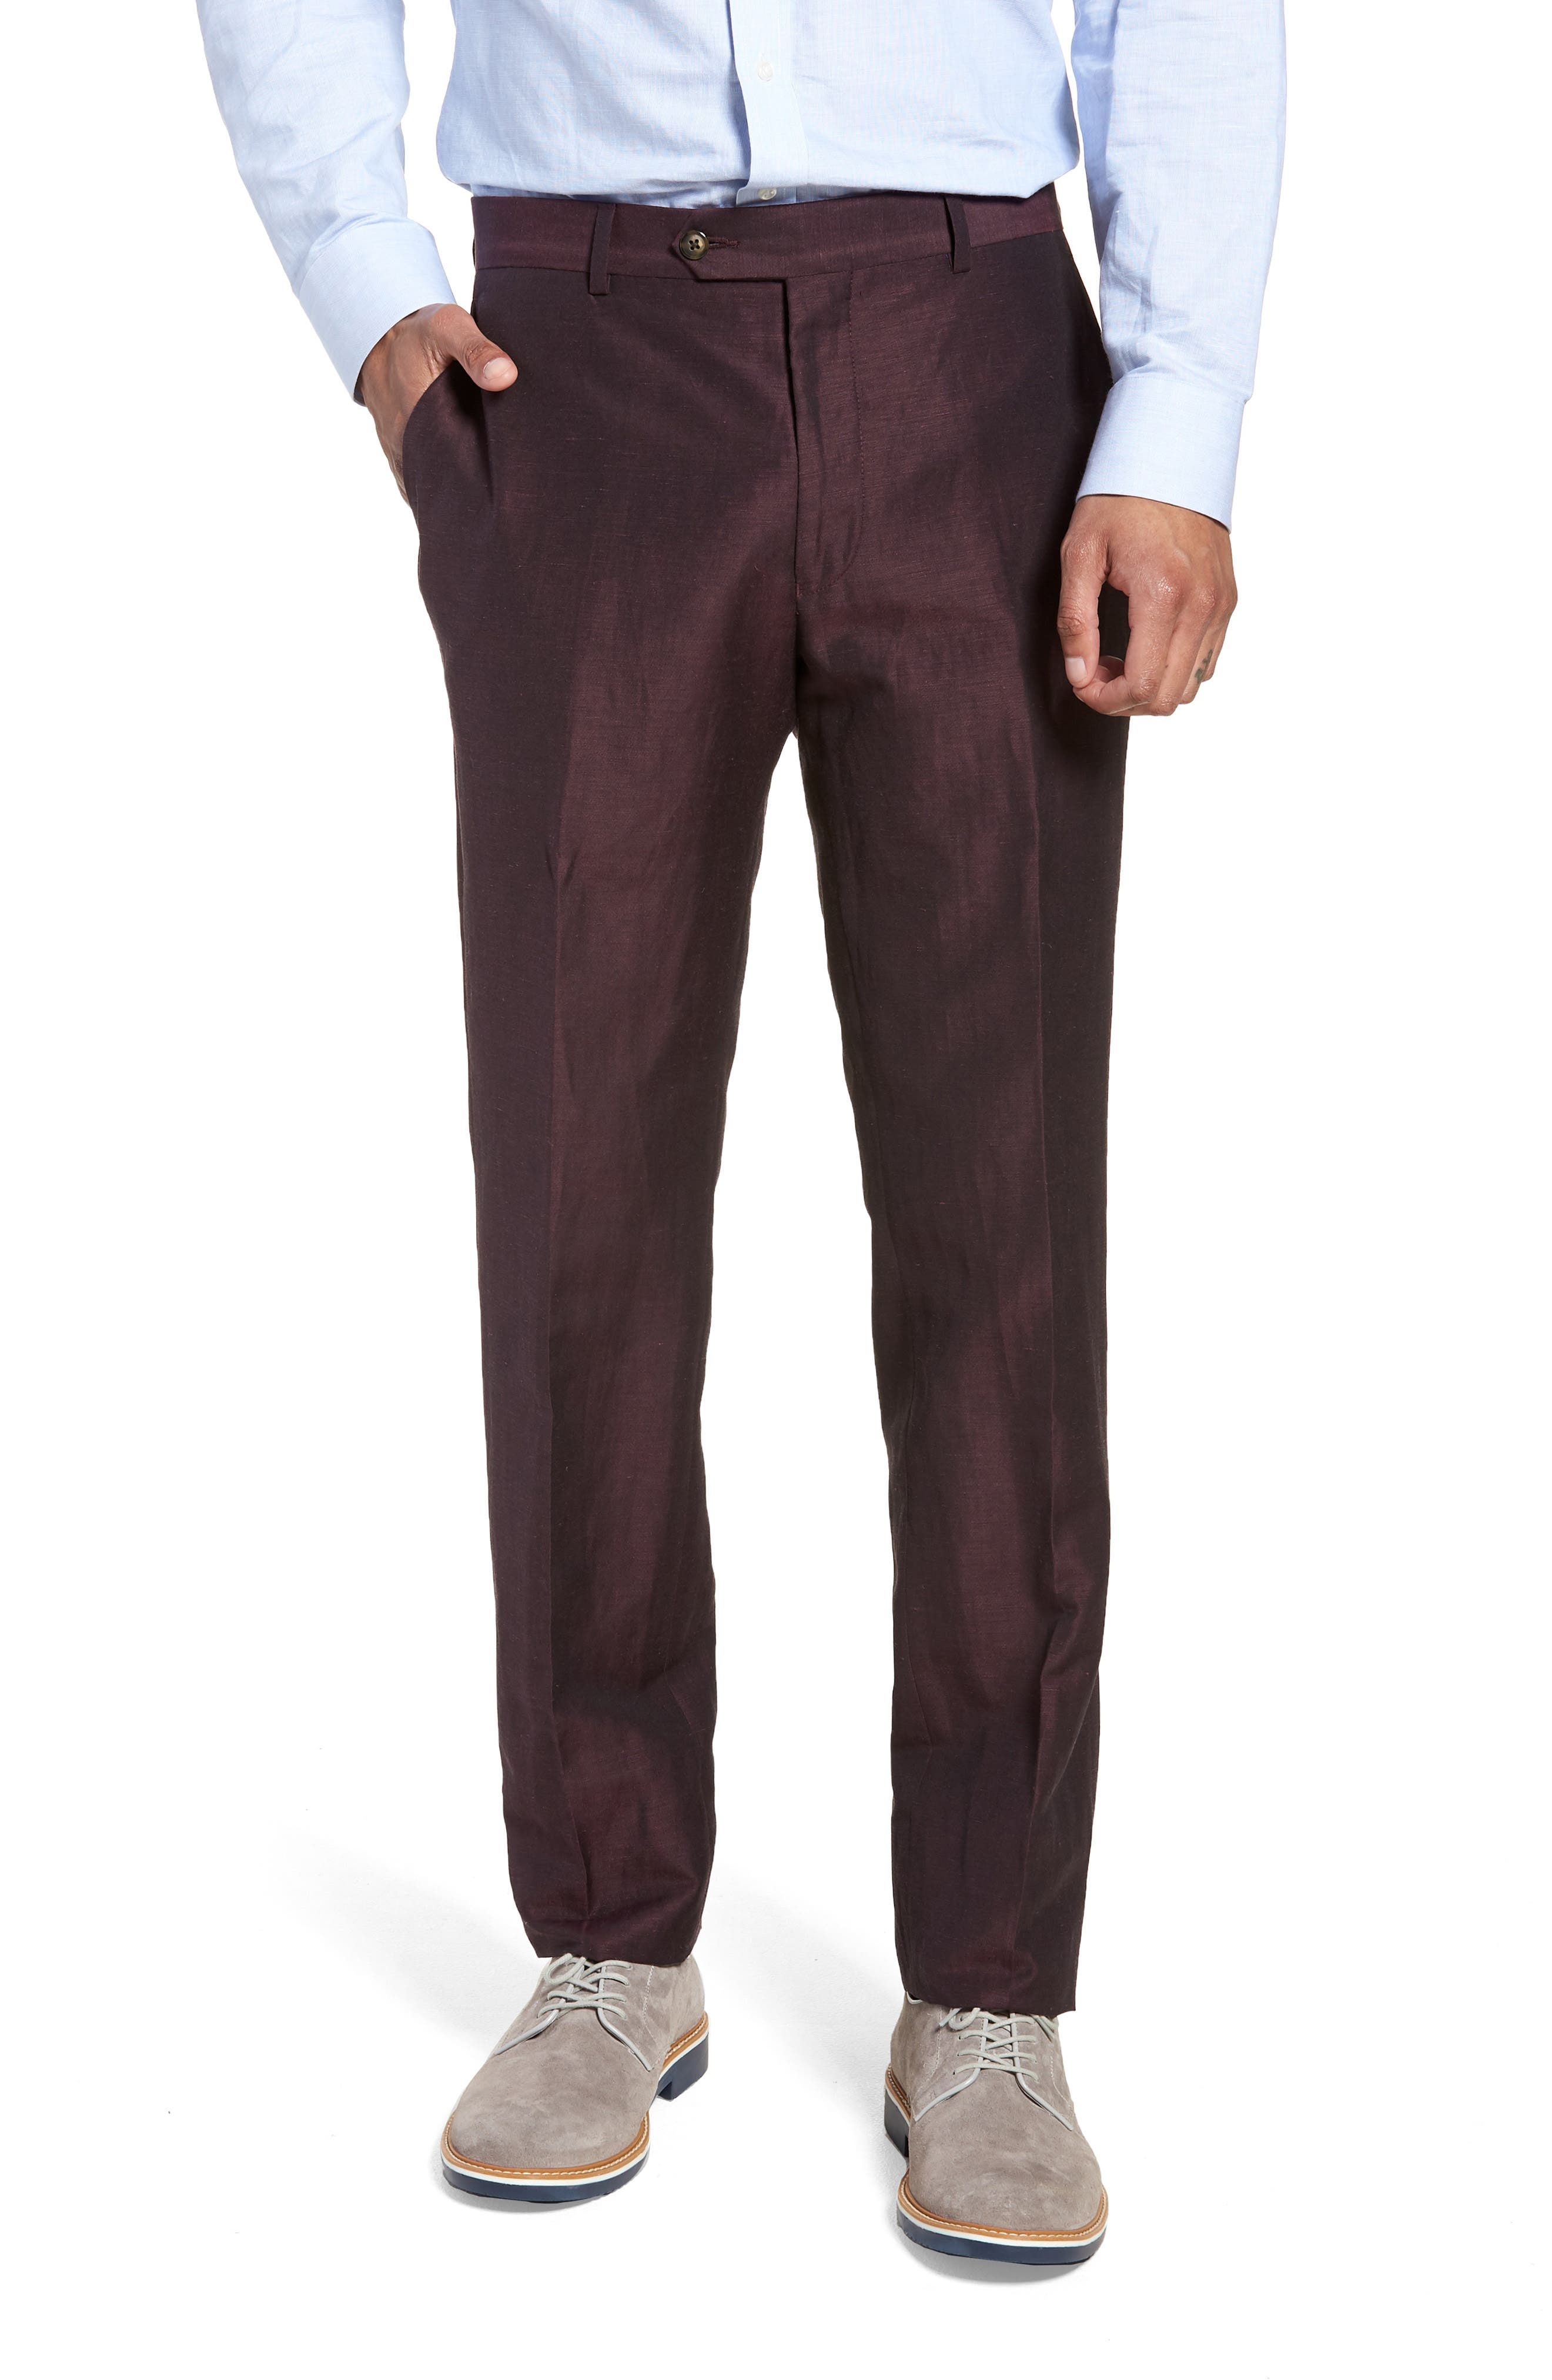 Dagger Flat Front Solid Wool & Linen Trousers,                             Main thumbnail 1, color,                             Plum